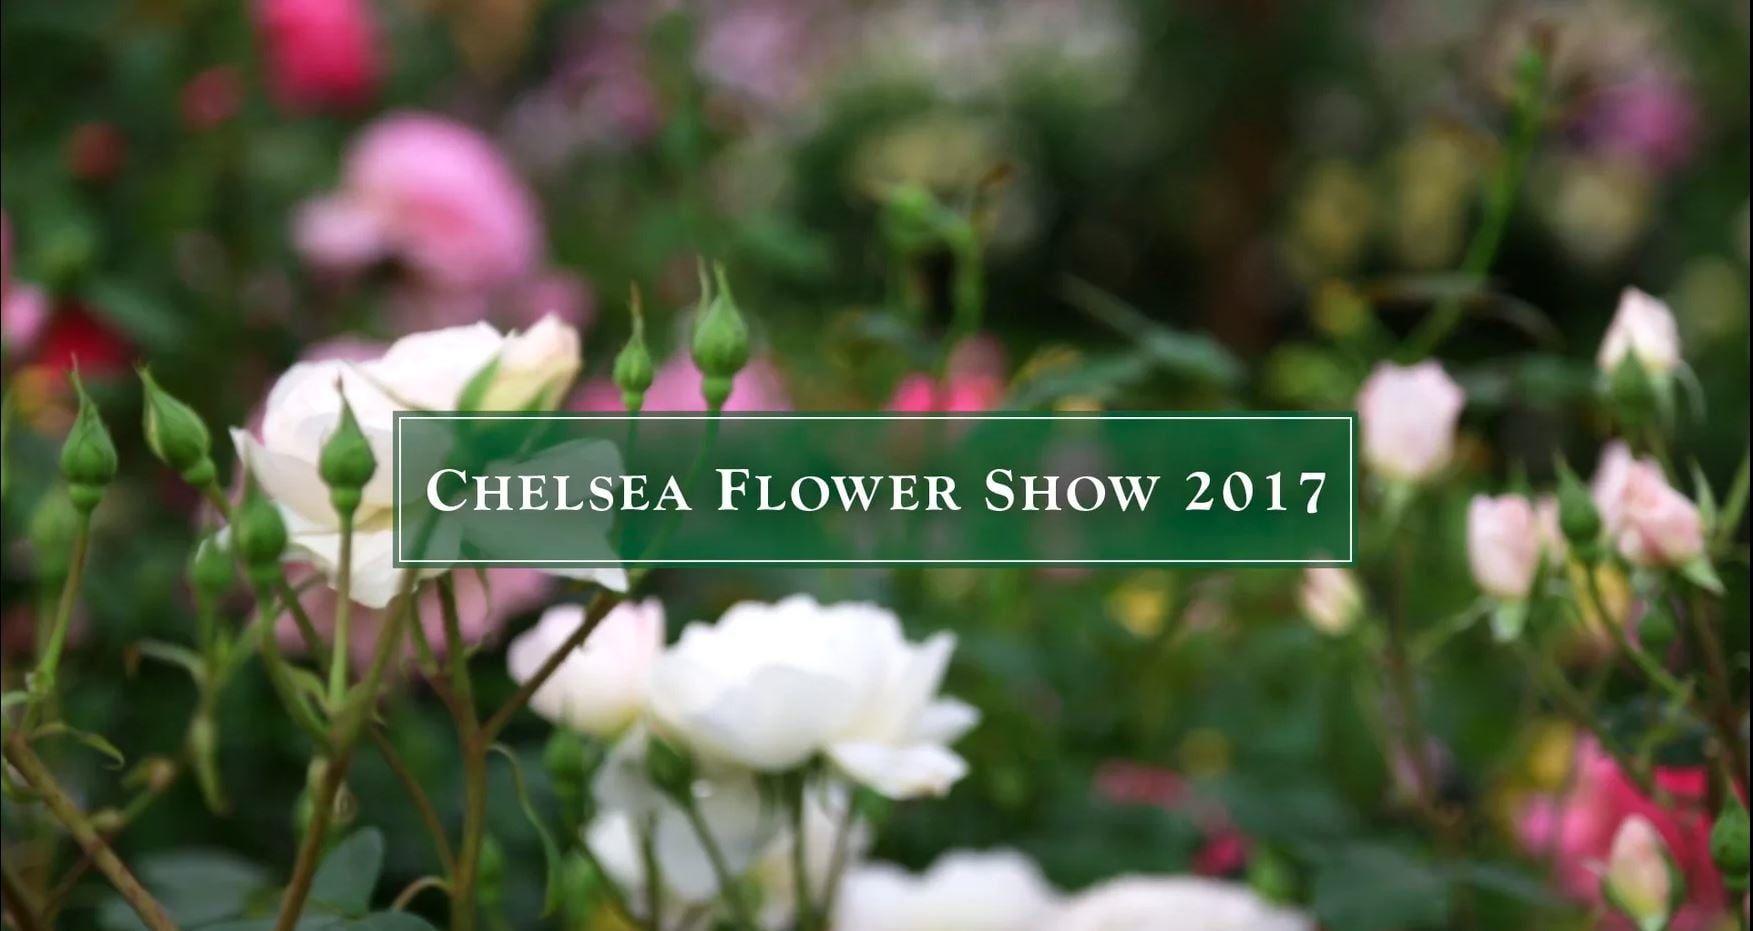 RHS Chelsea Flower Show 2017